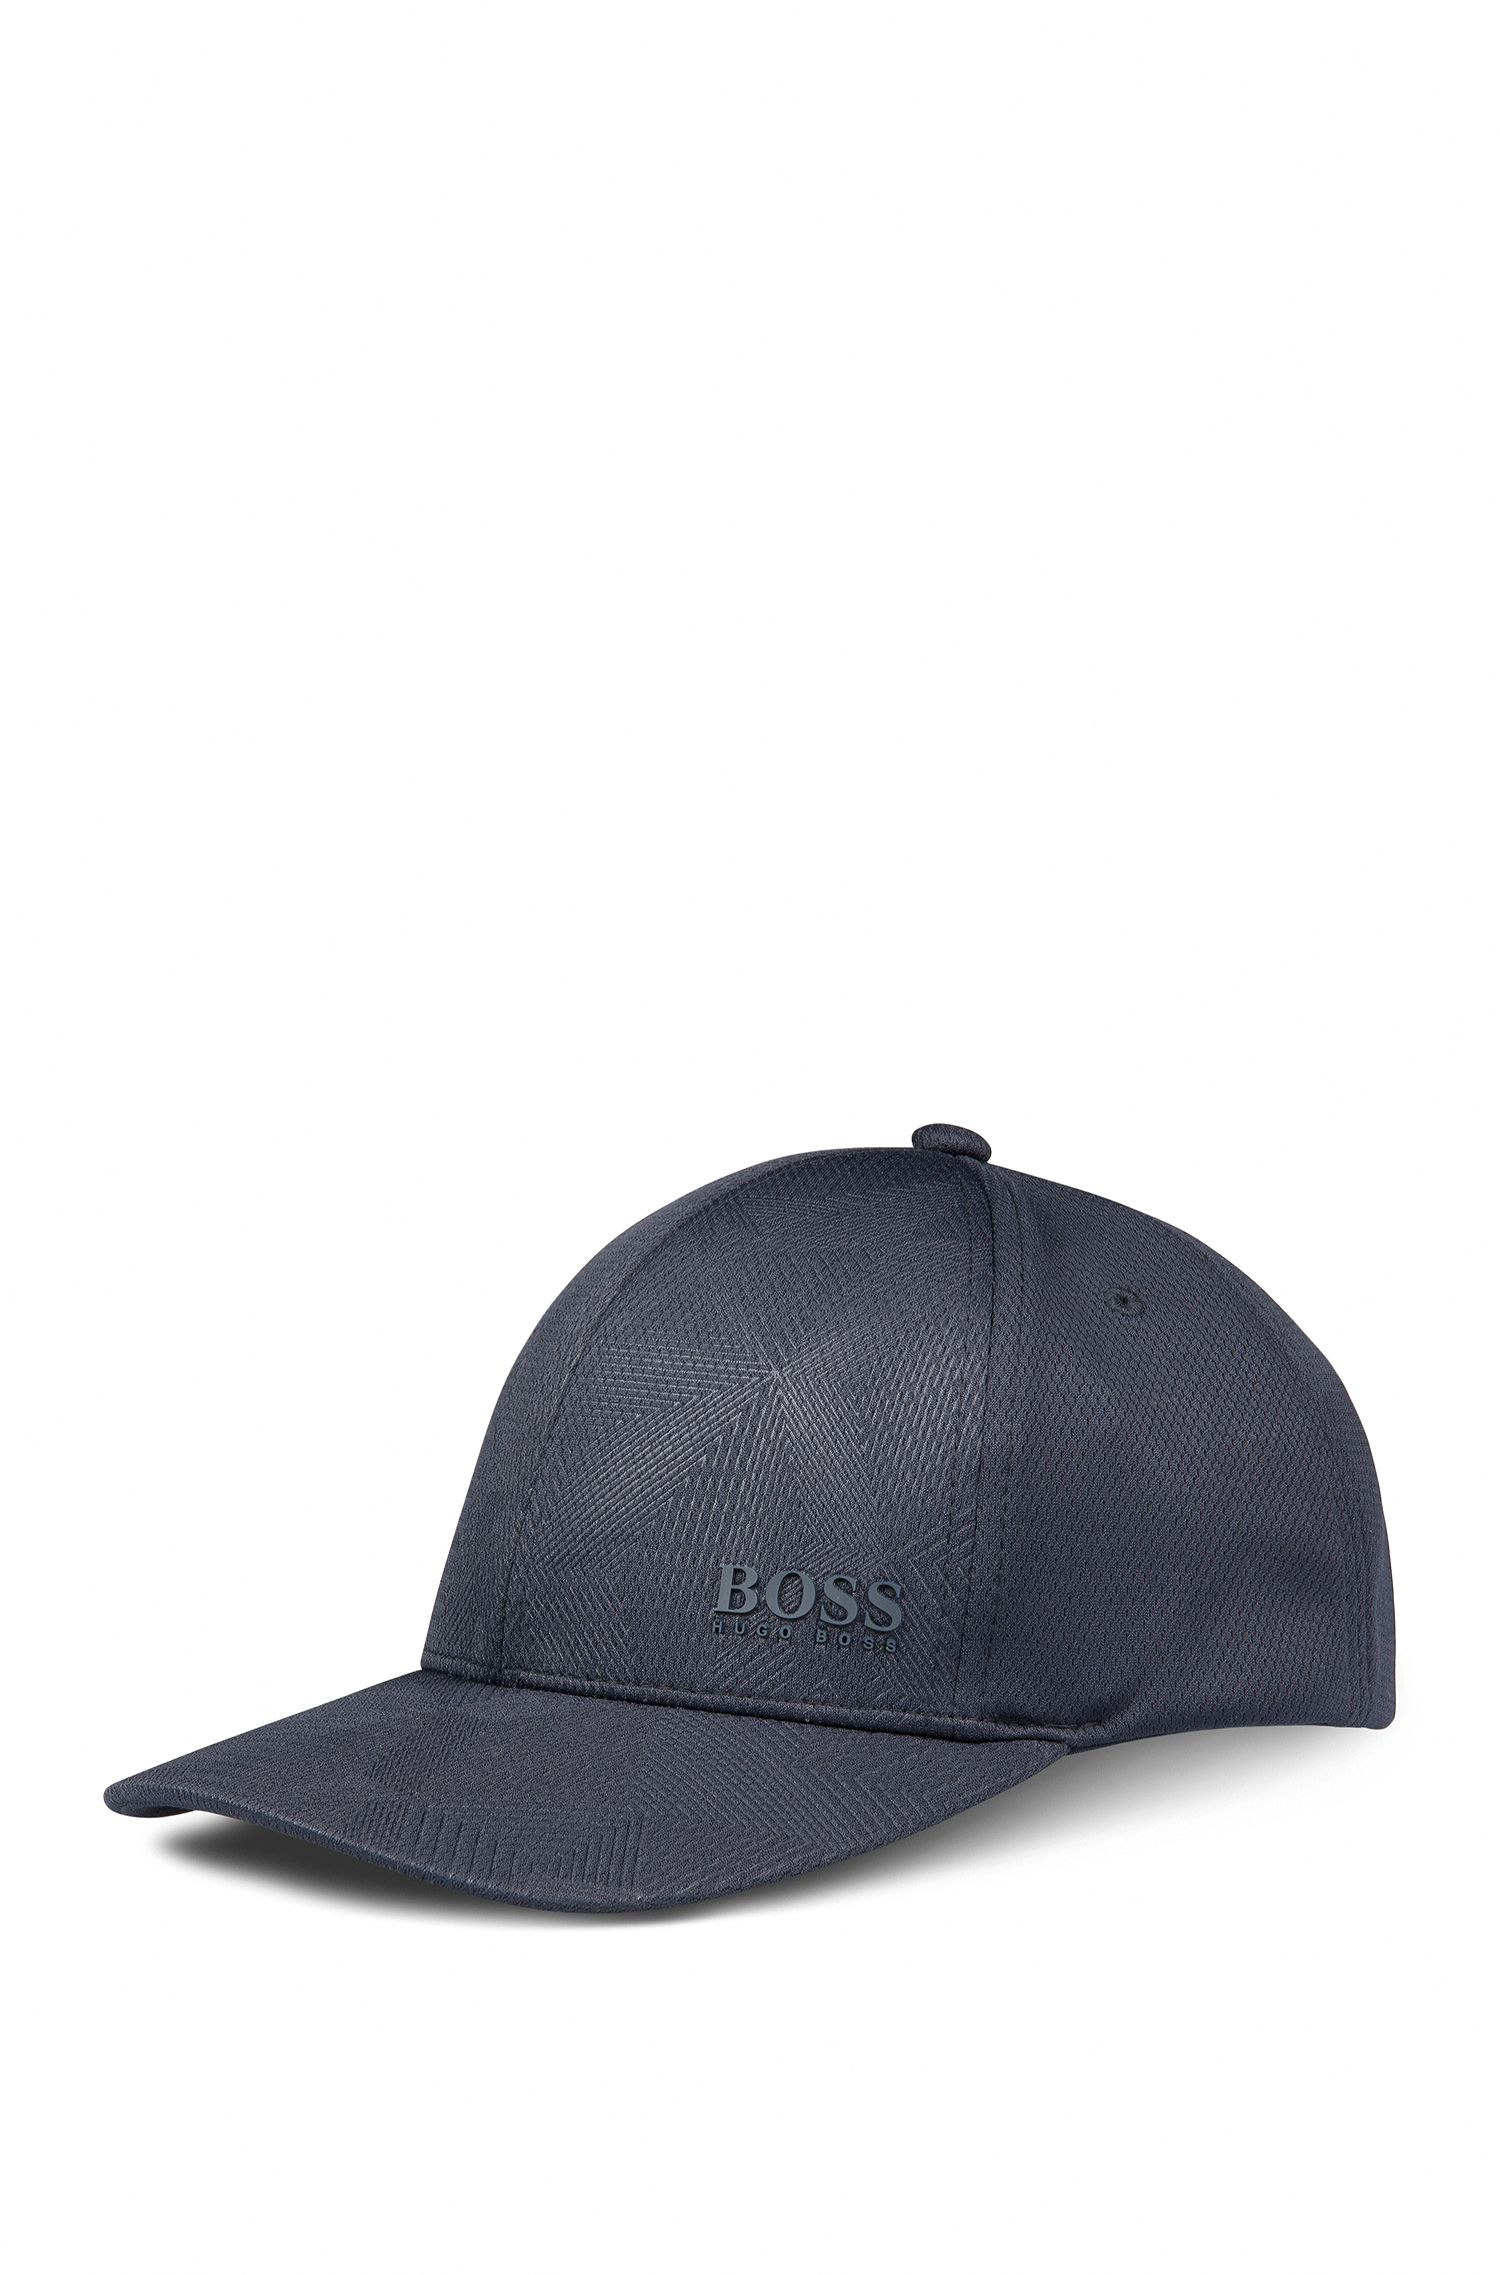 Geometric Print Baseball Cap | Printcap